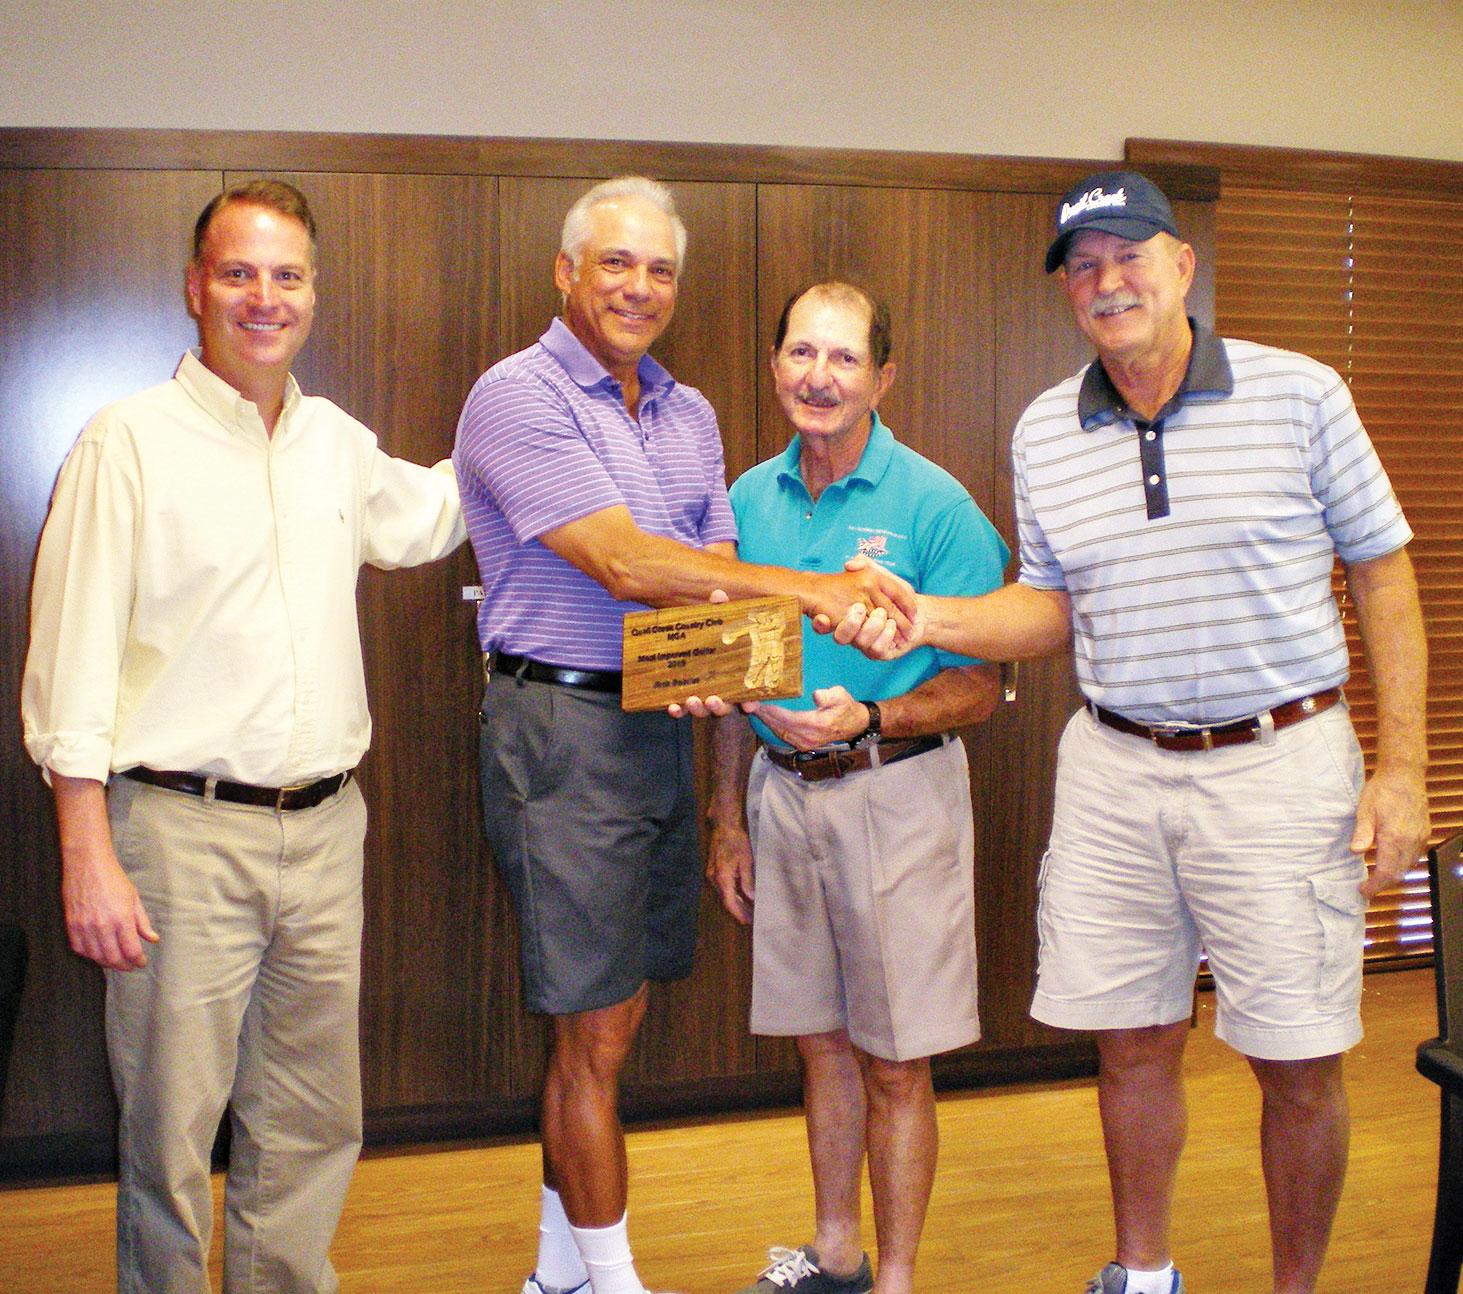 Left to right: Head Golf Professional Joel Jaress, Rick Bobillot, Men's Club President Skip Fumia and Handicap Chairman Dave Schutt